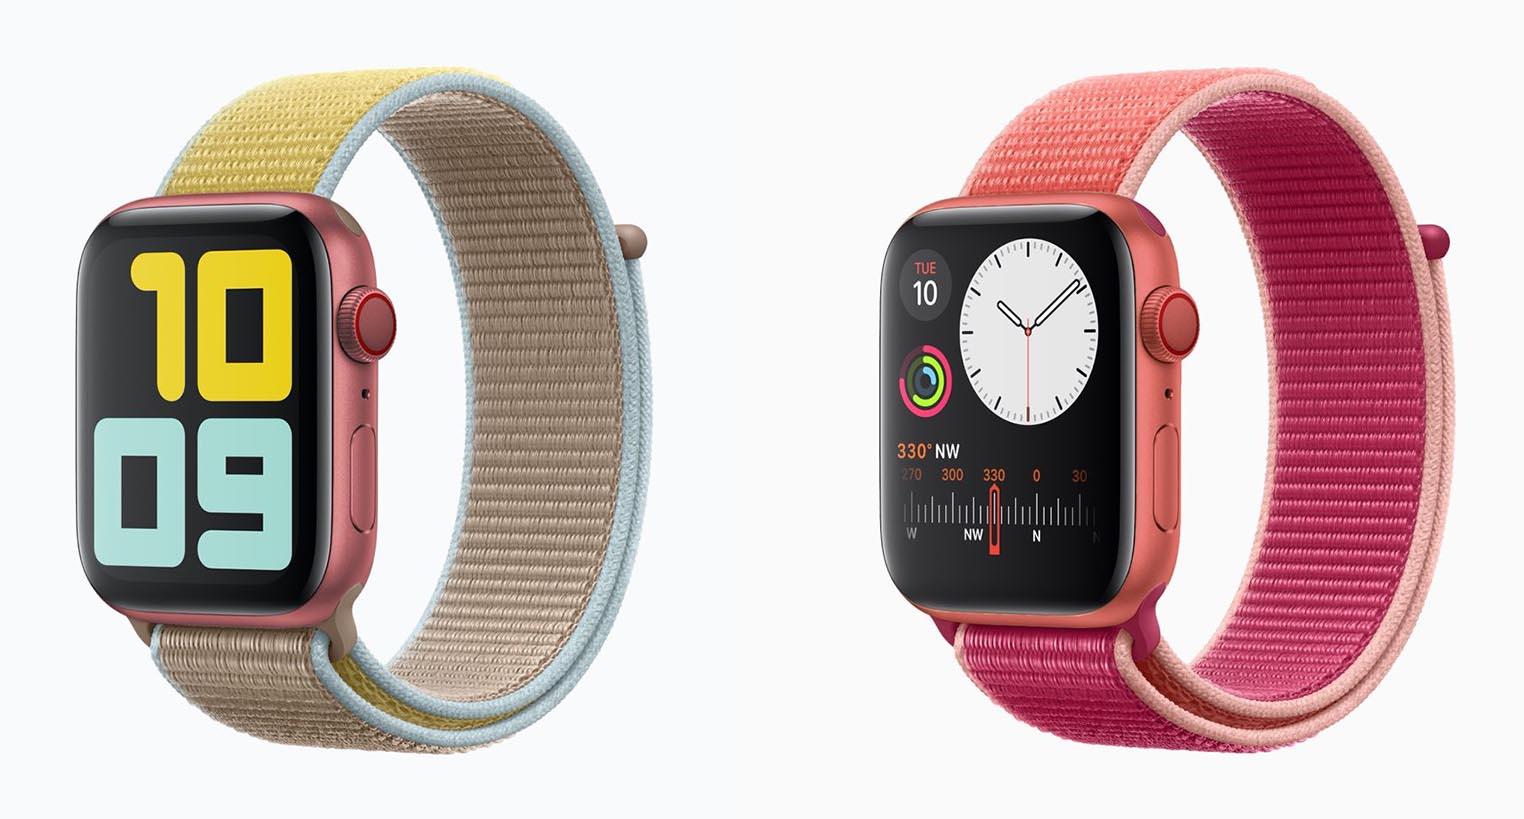 apple-watch-red-2020.jpg